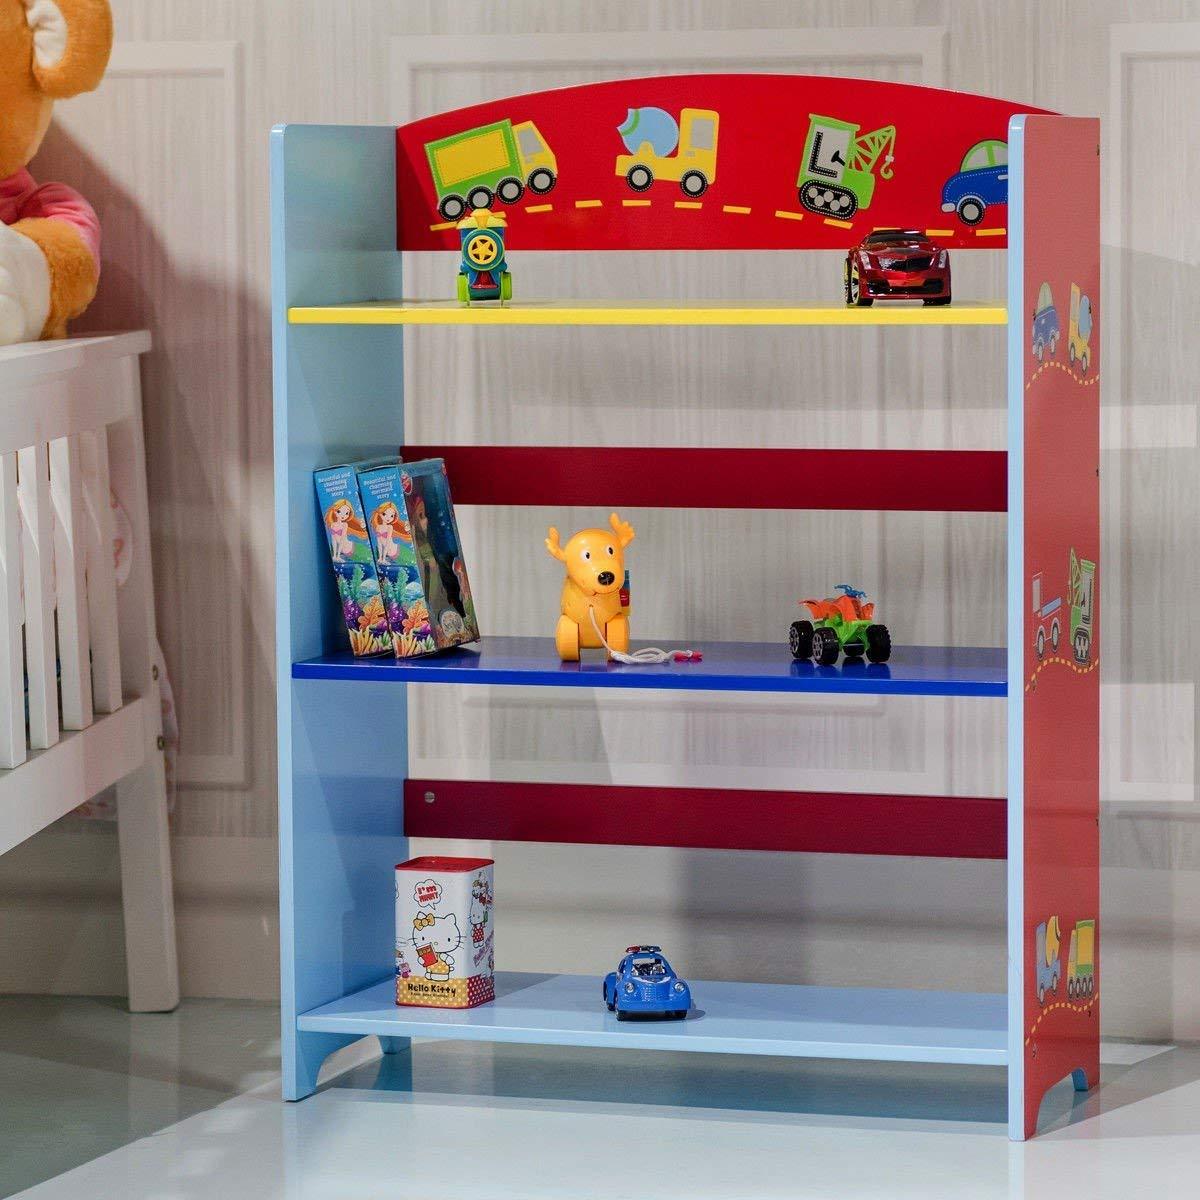 Get Quotations Custpromo Kids Bookshelf 3 Tier Adorable Corner Bookcase Serial 2